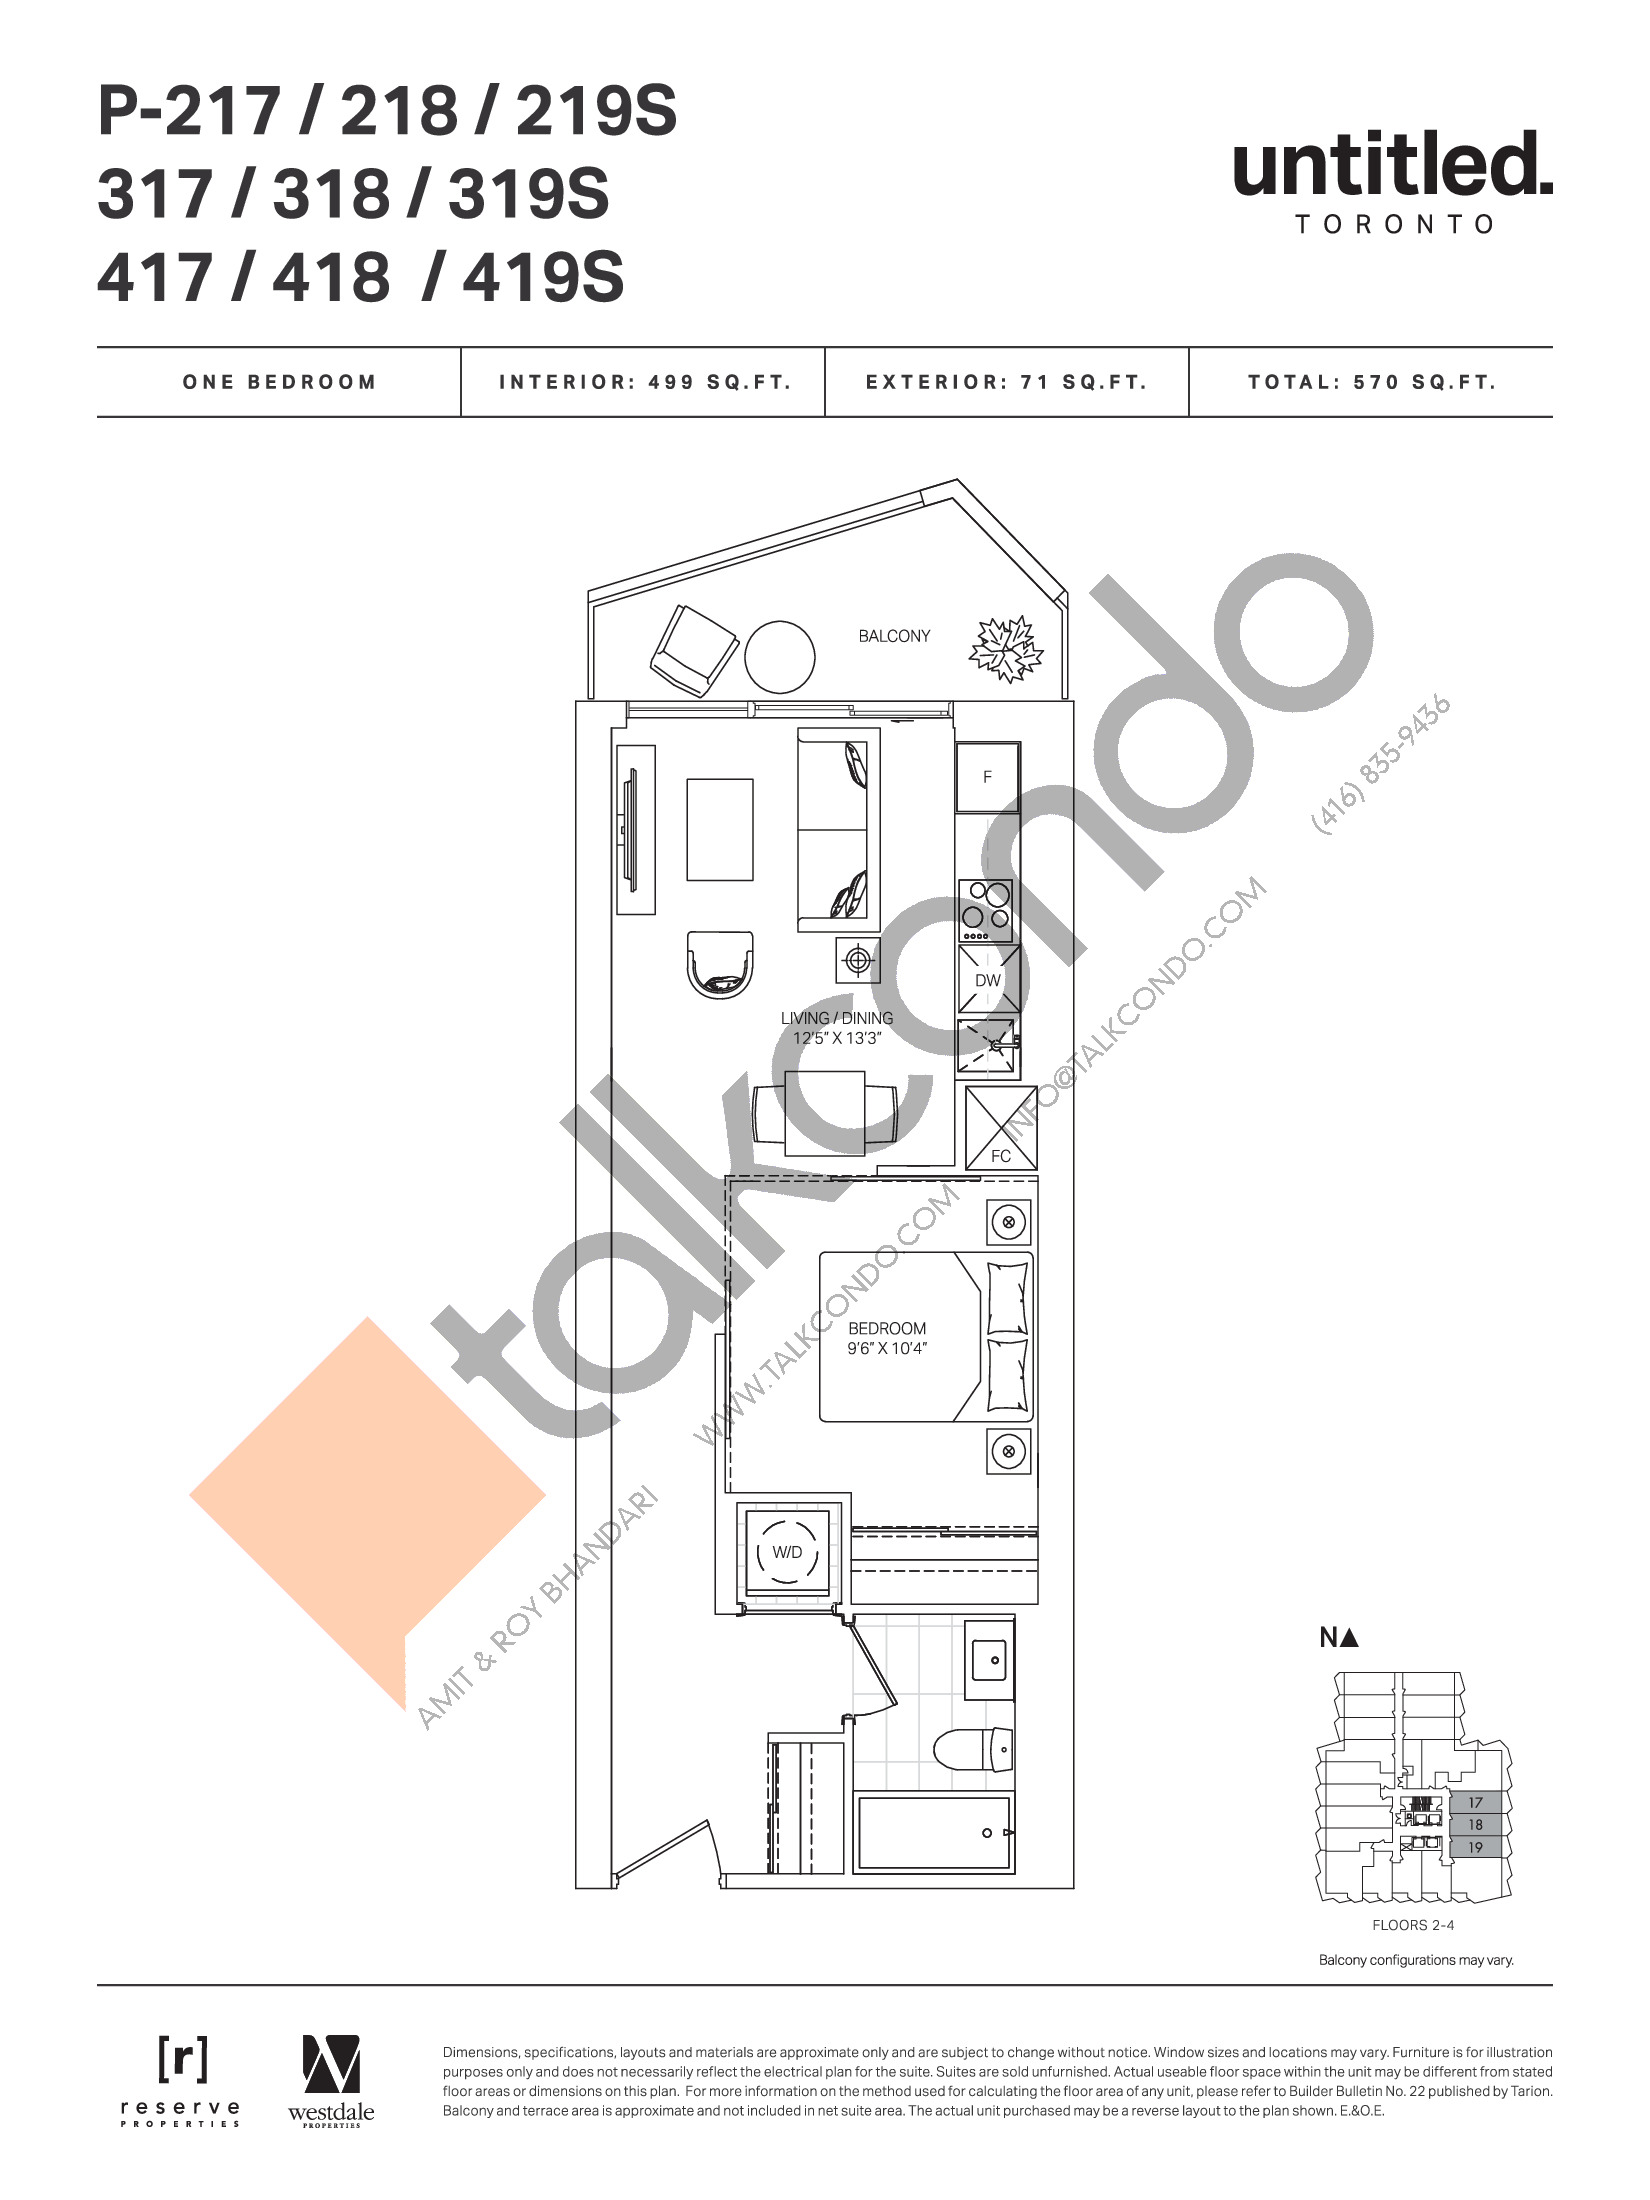 P-217 / 218 / 219S / 317 / 318 / 319S / 417 / 418 / 419S Floor Plan at Untitled Toronto Condos - 499 sq.ft